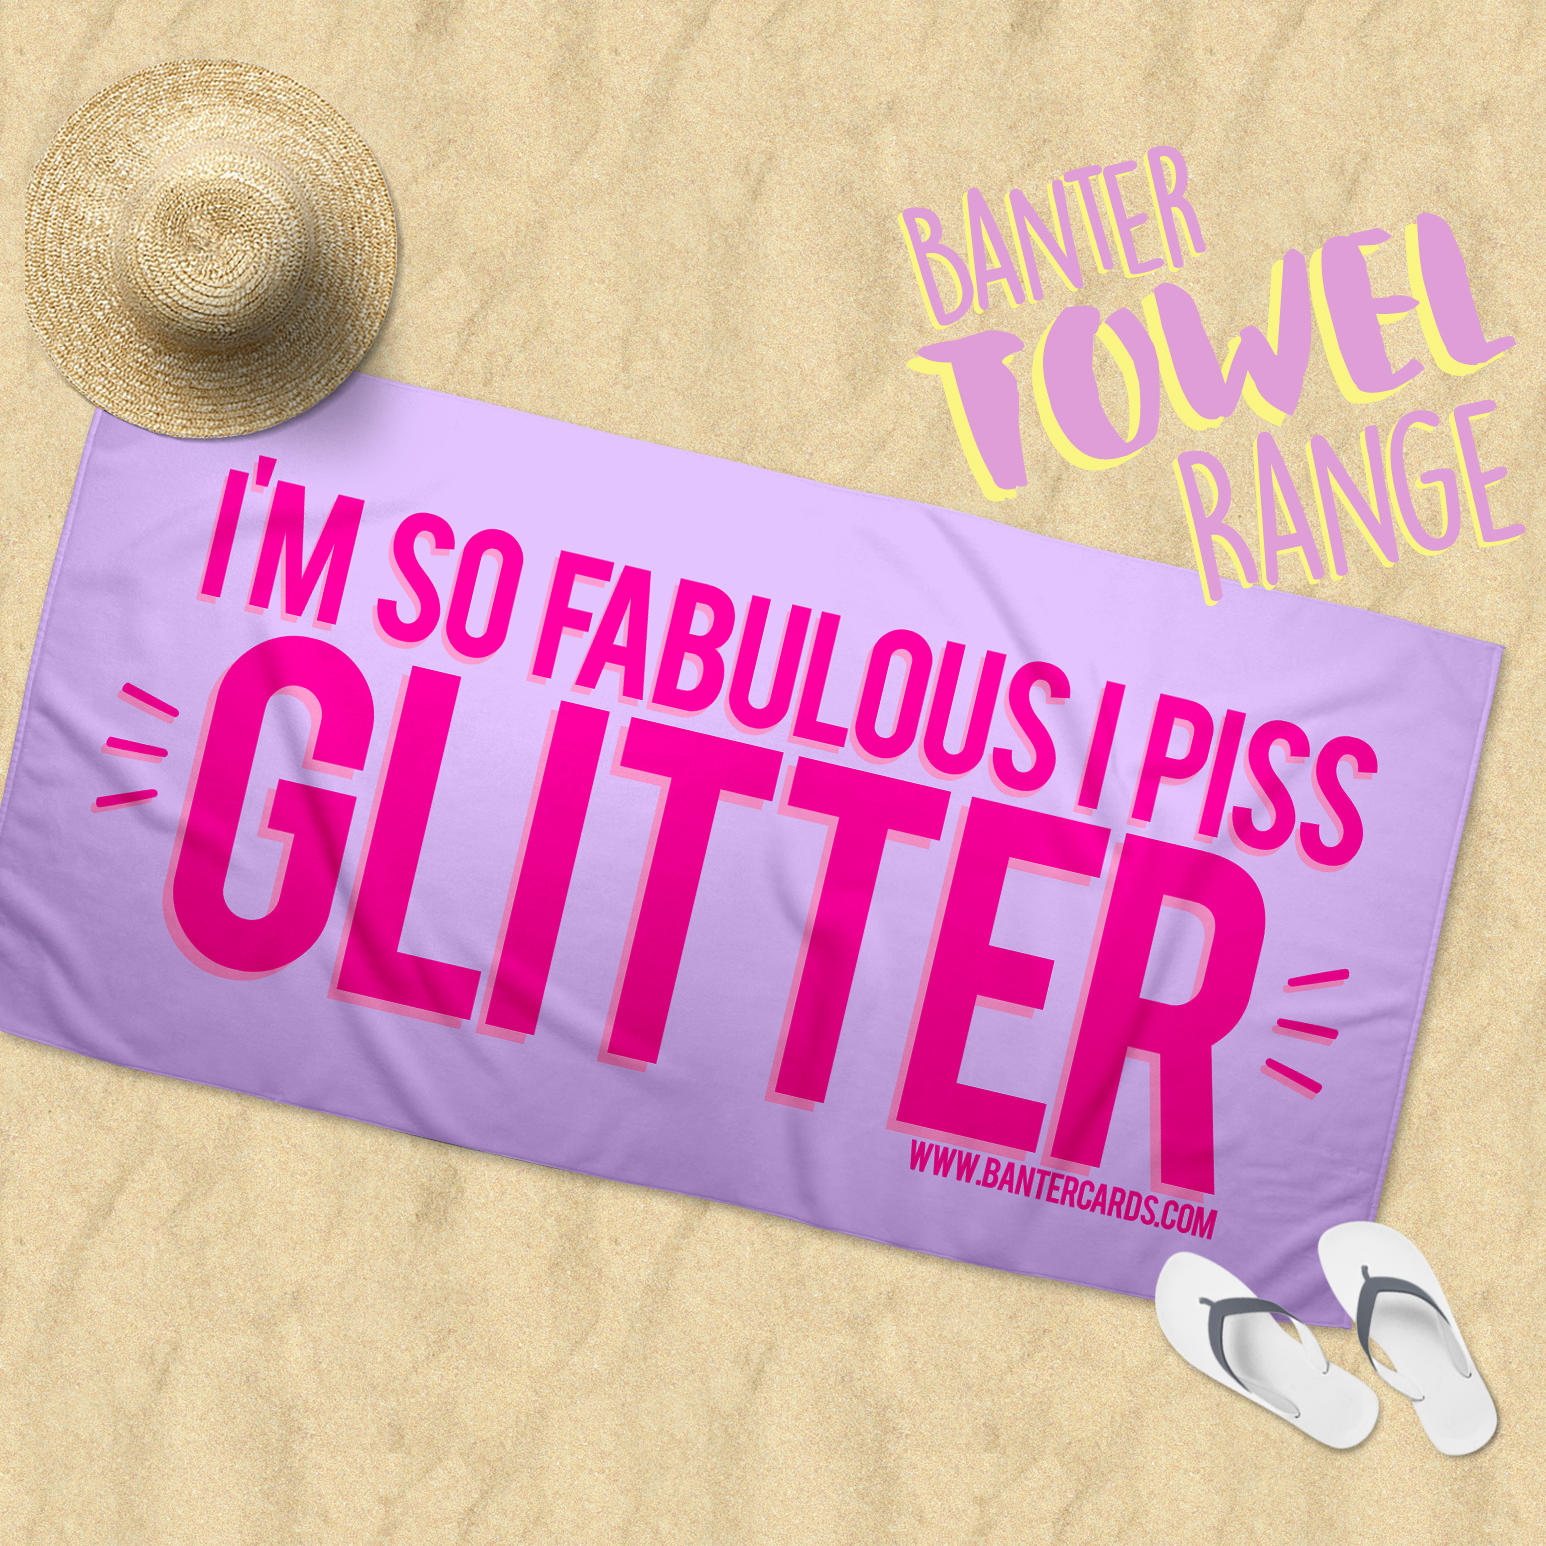 I'M SO FABULOUS I PISS GLITTER TOWEL